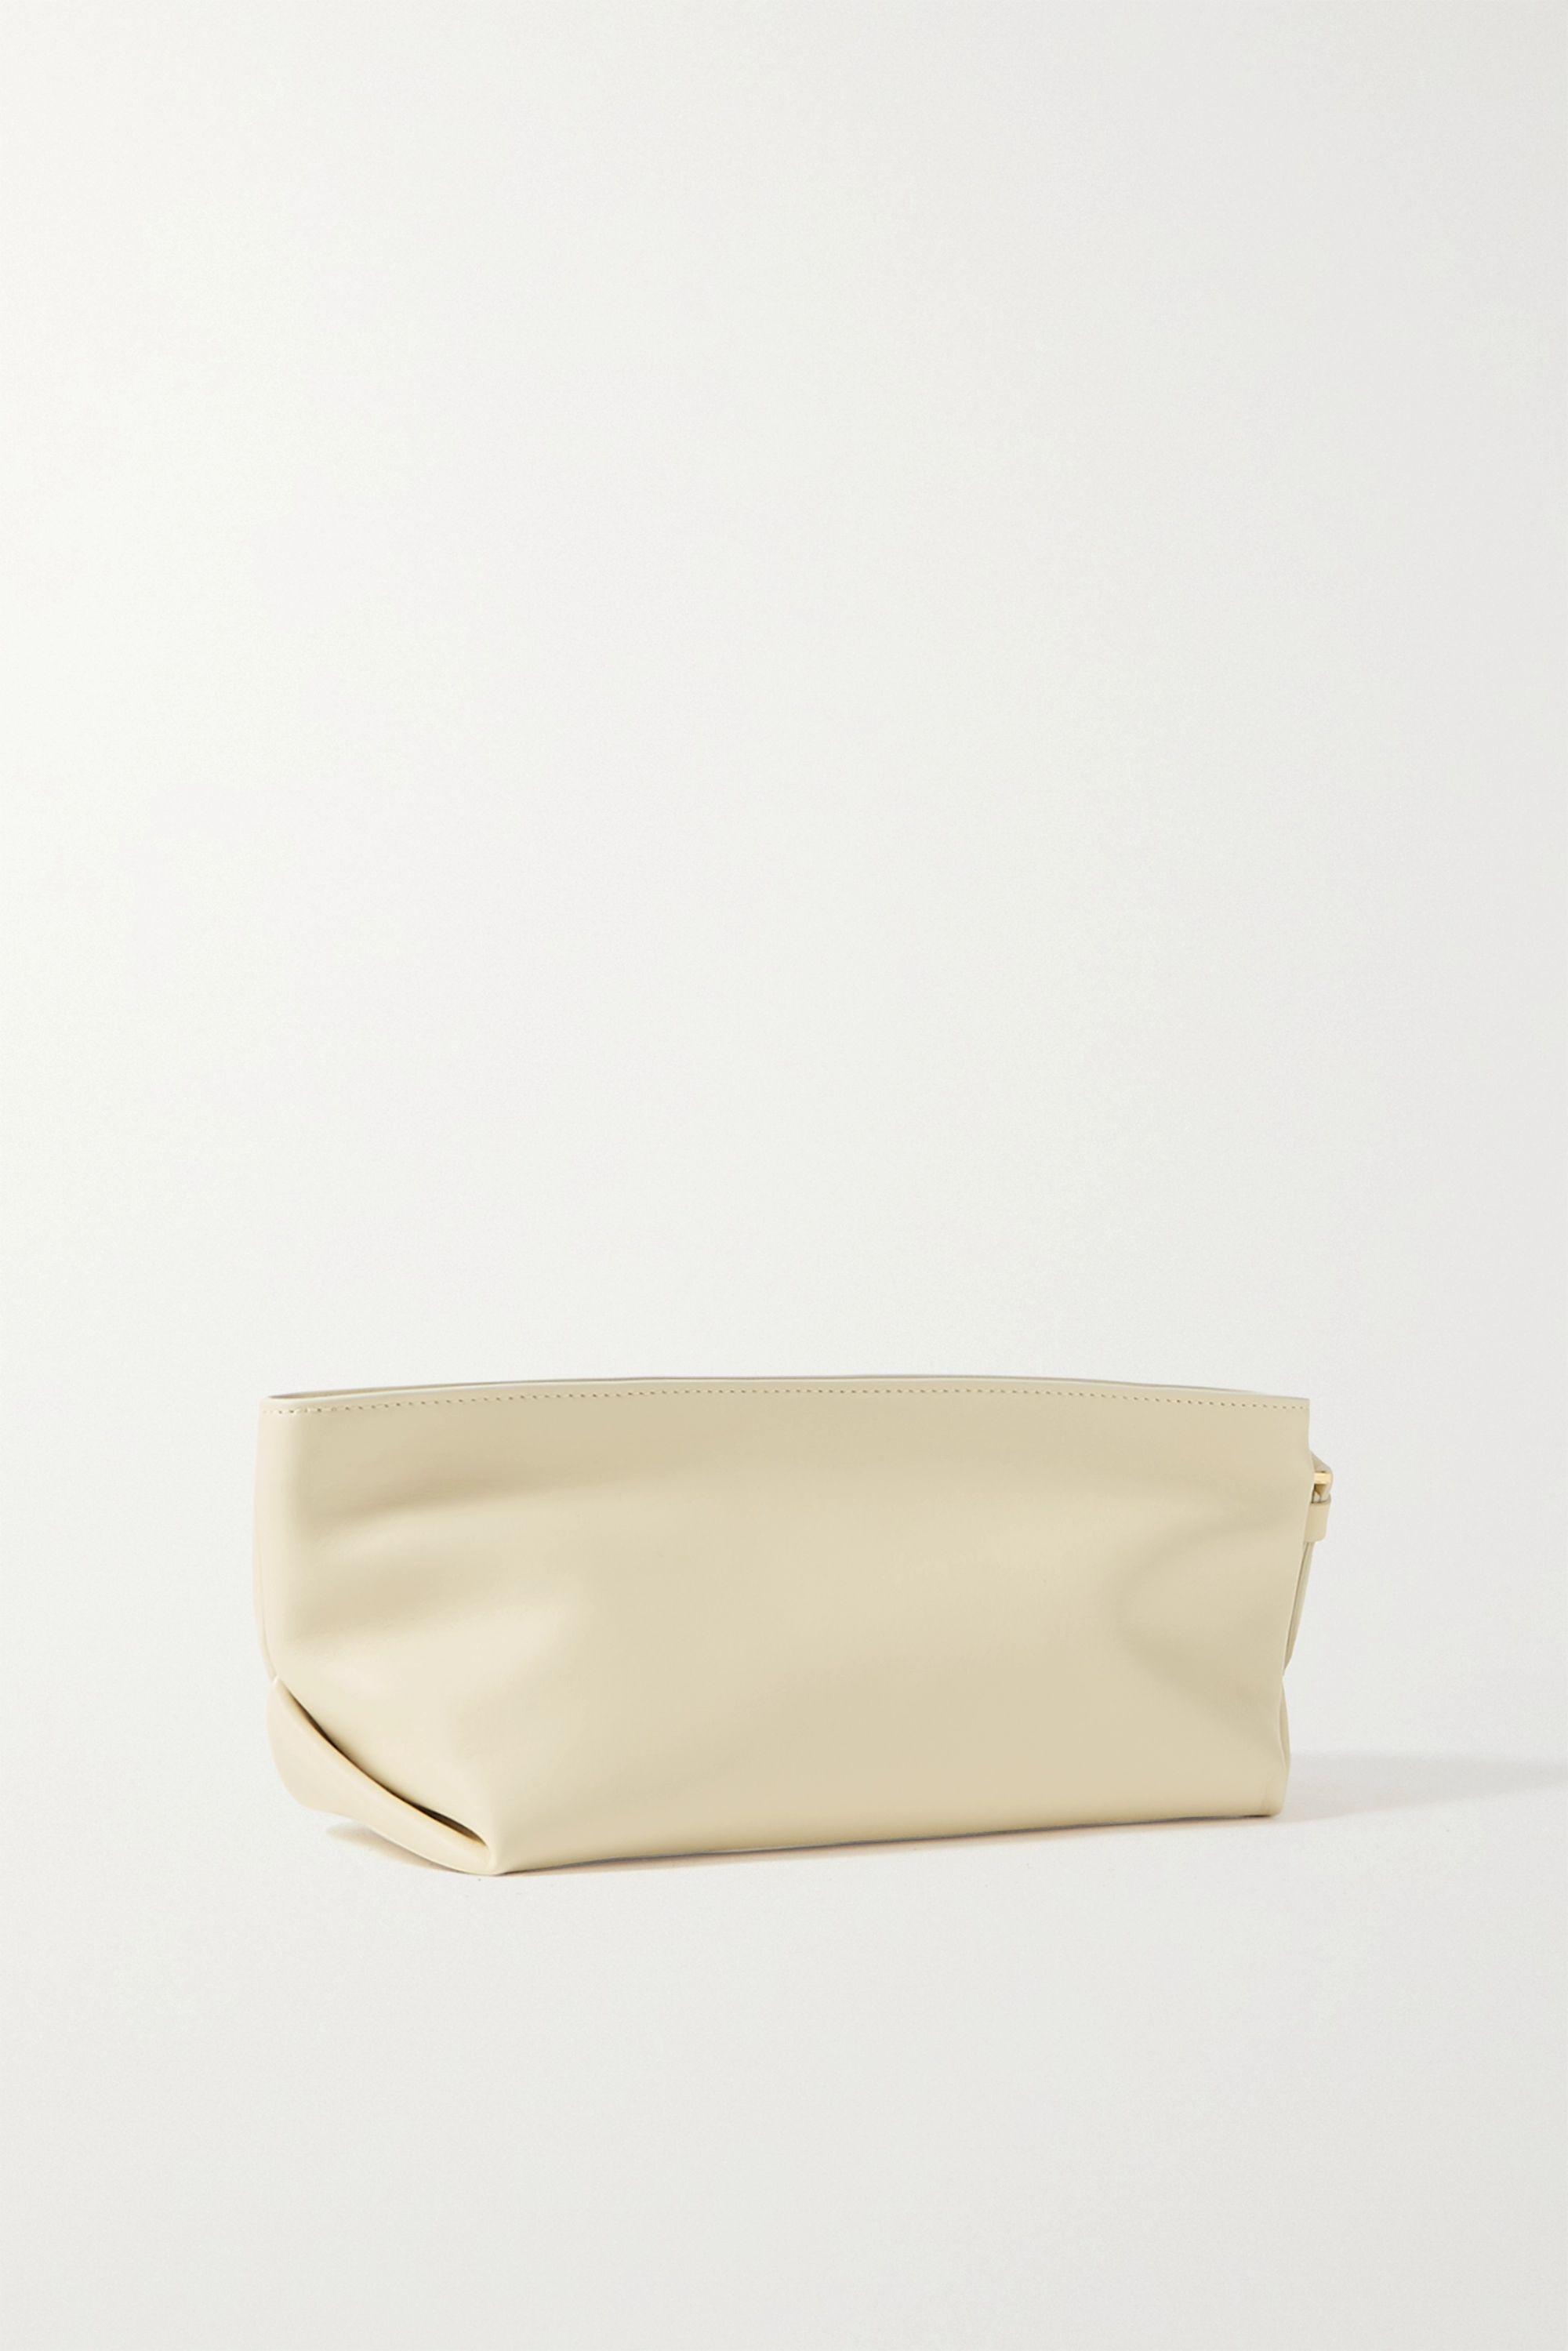 Khaite Alma small leather clutch